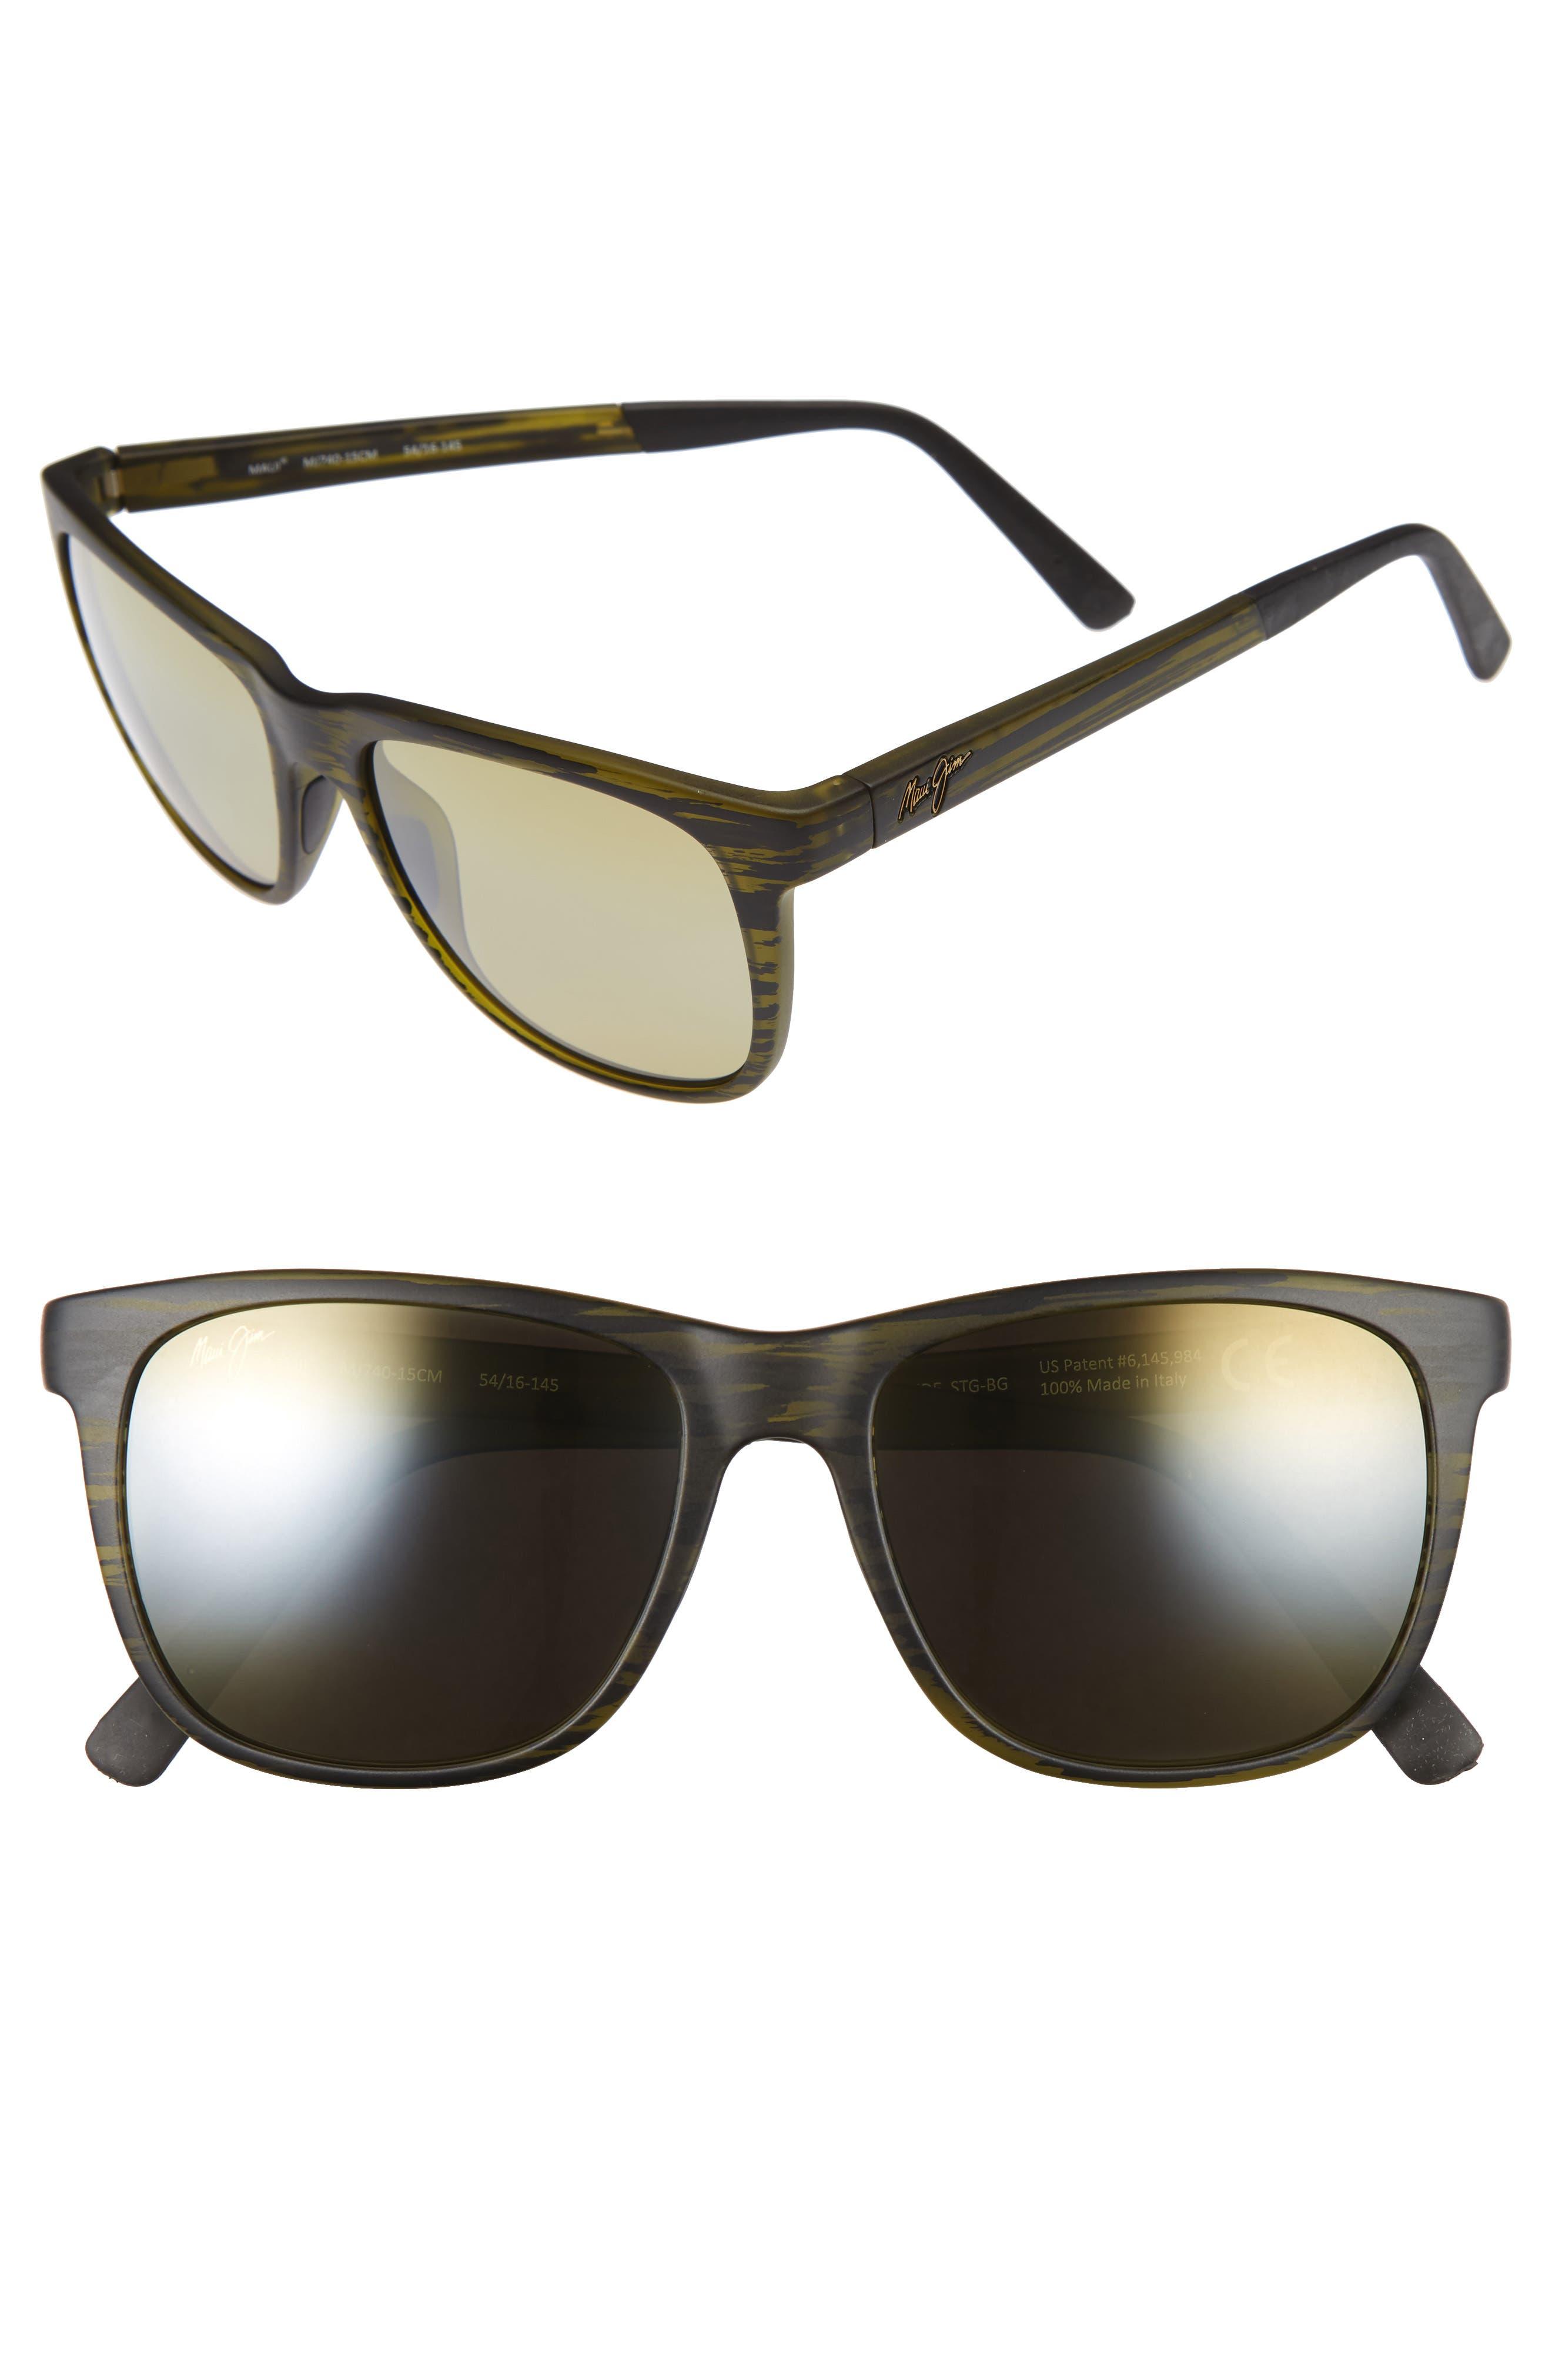 Maui Jim Tail Slide 5m Polarized Sunglasses - Matte Green Stripe